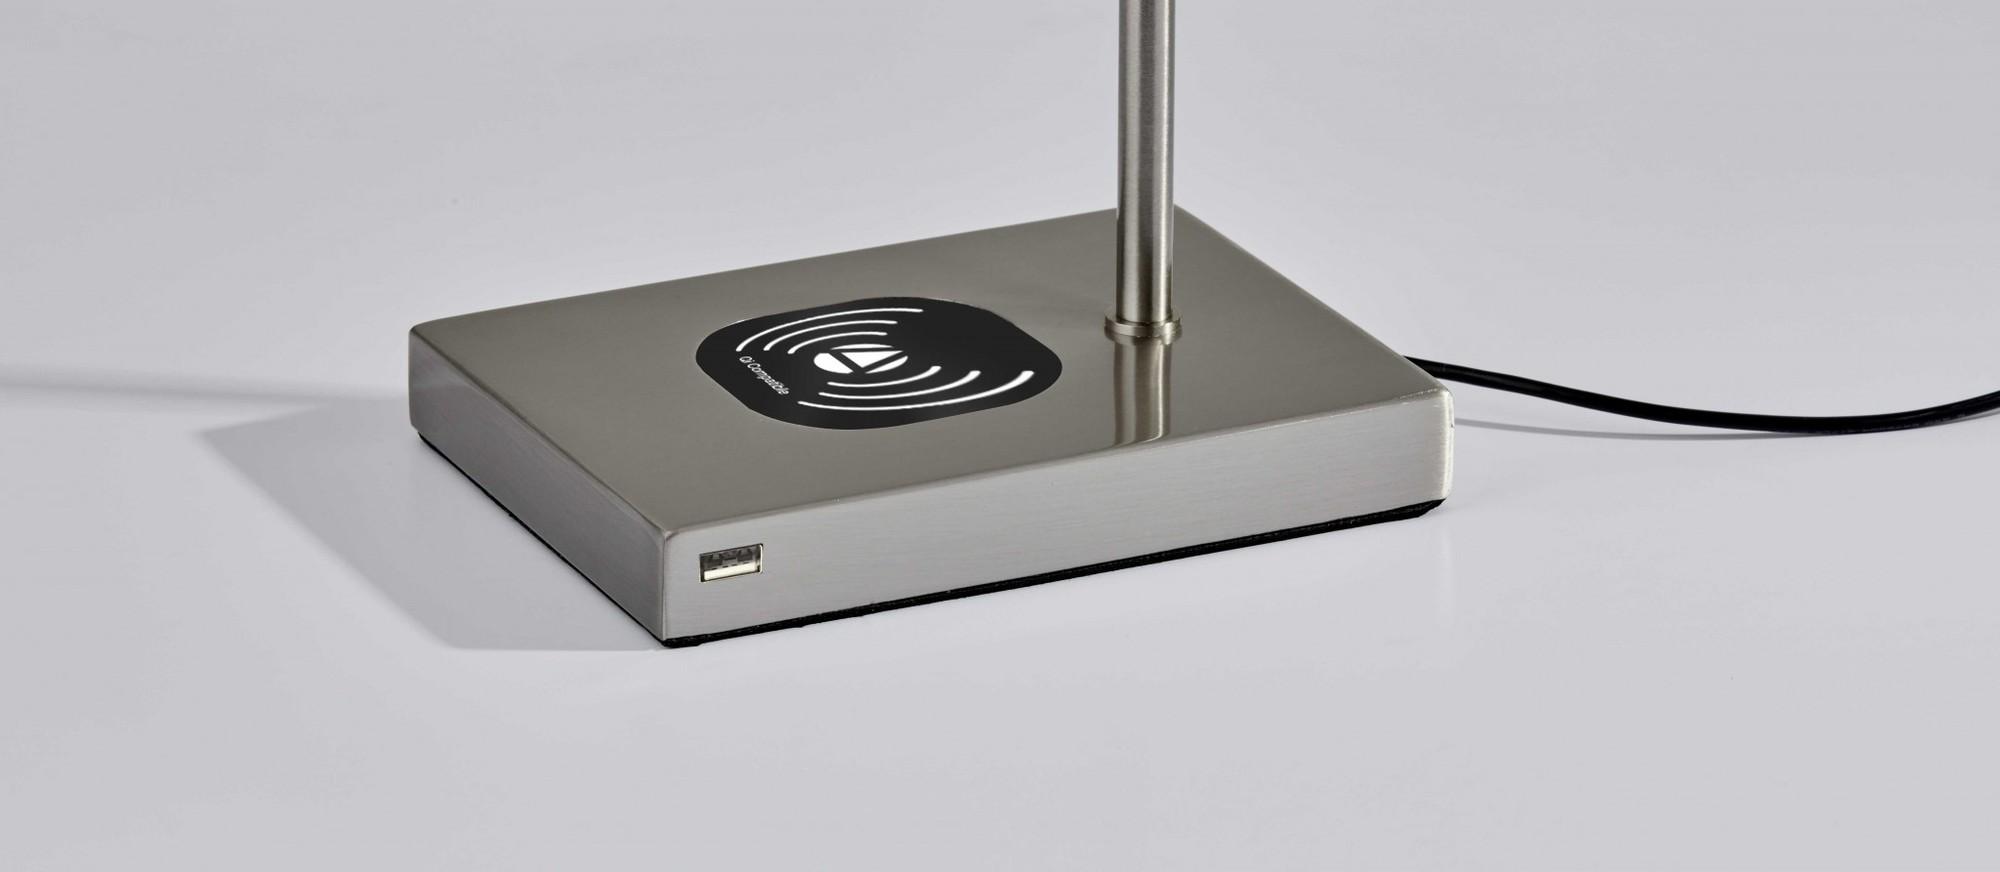 "5"" X 22.5""  X 12.25-22.25"" Brushed Steel Metal LED Desk Lamp"